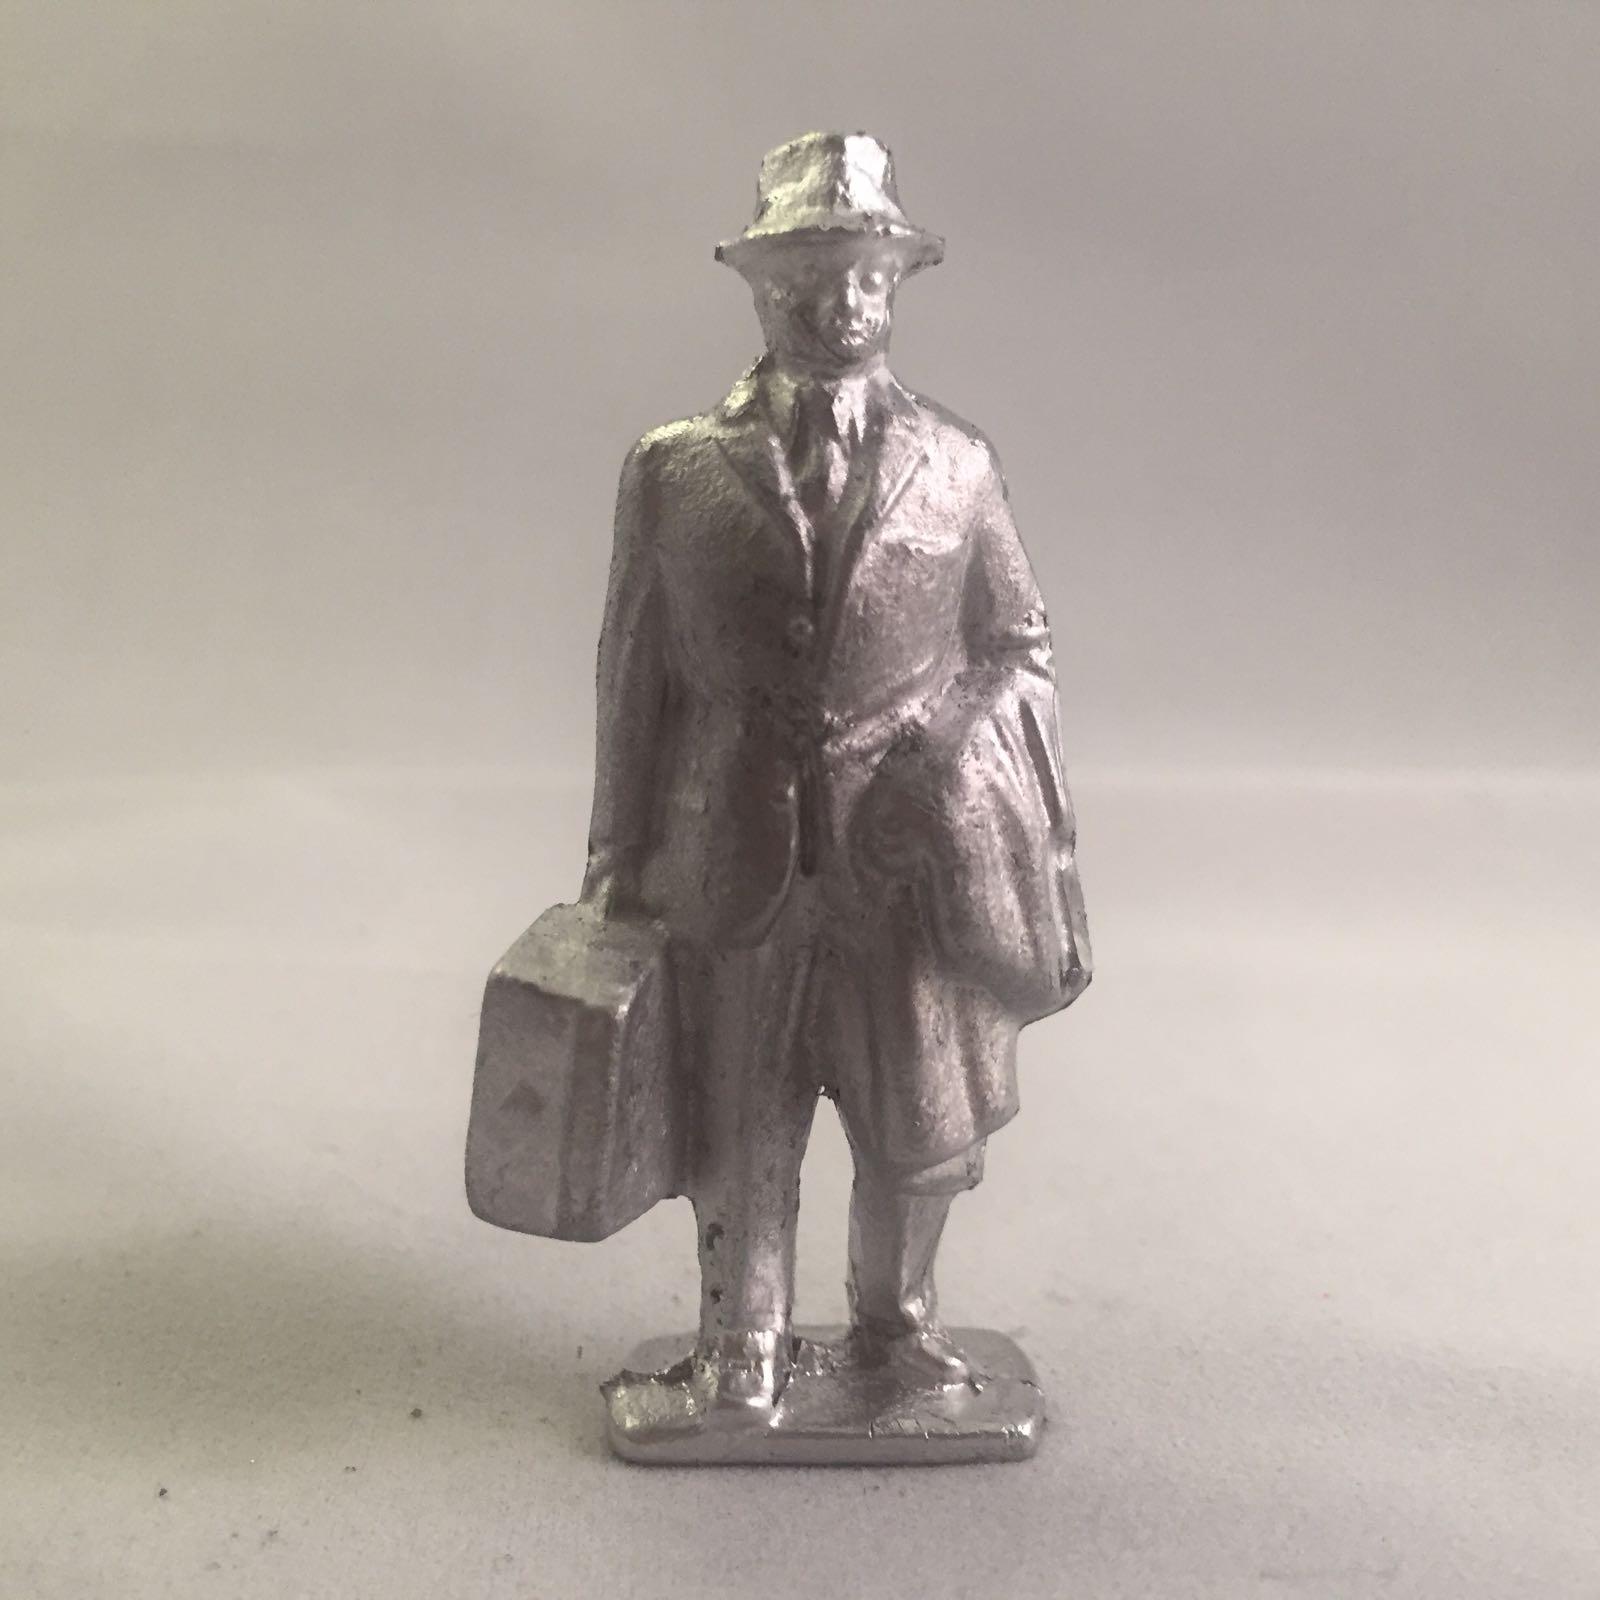 B17. Travelling Salesman